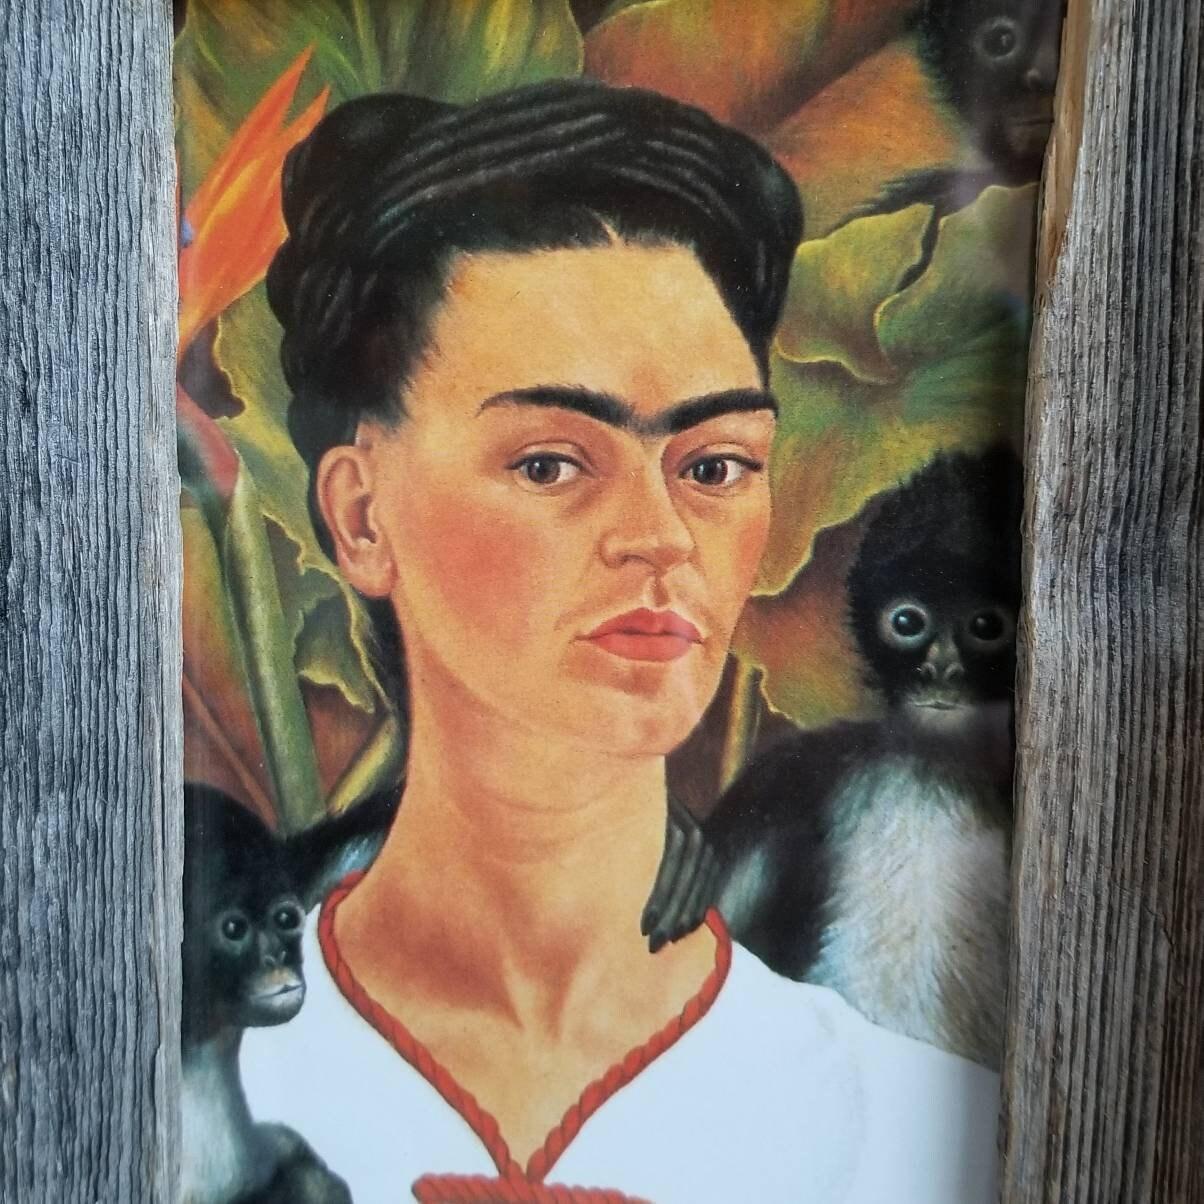 Self Portrait with Monkey, 1940 by Frida Kahlo